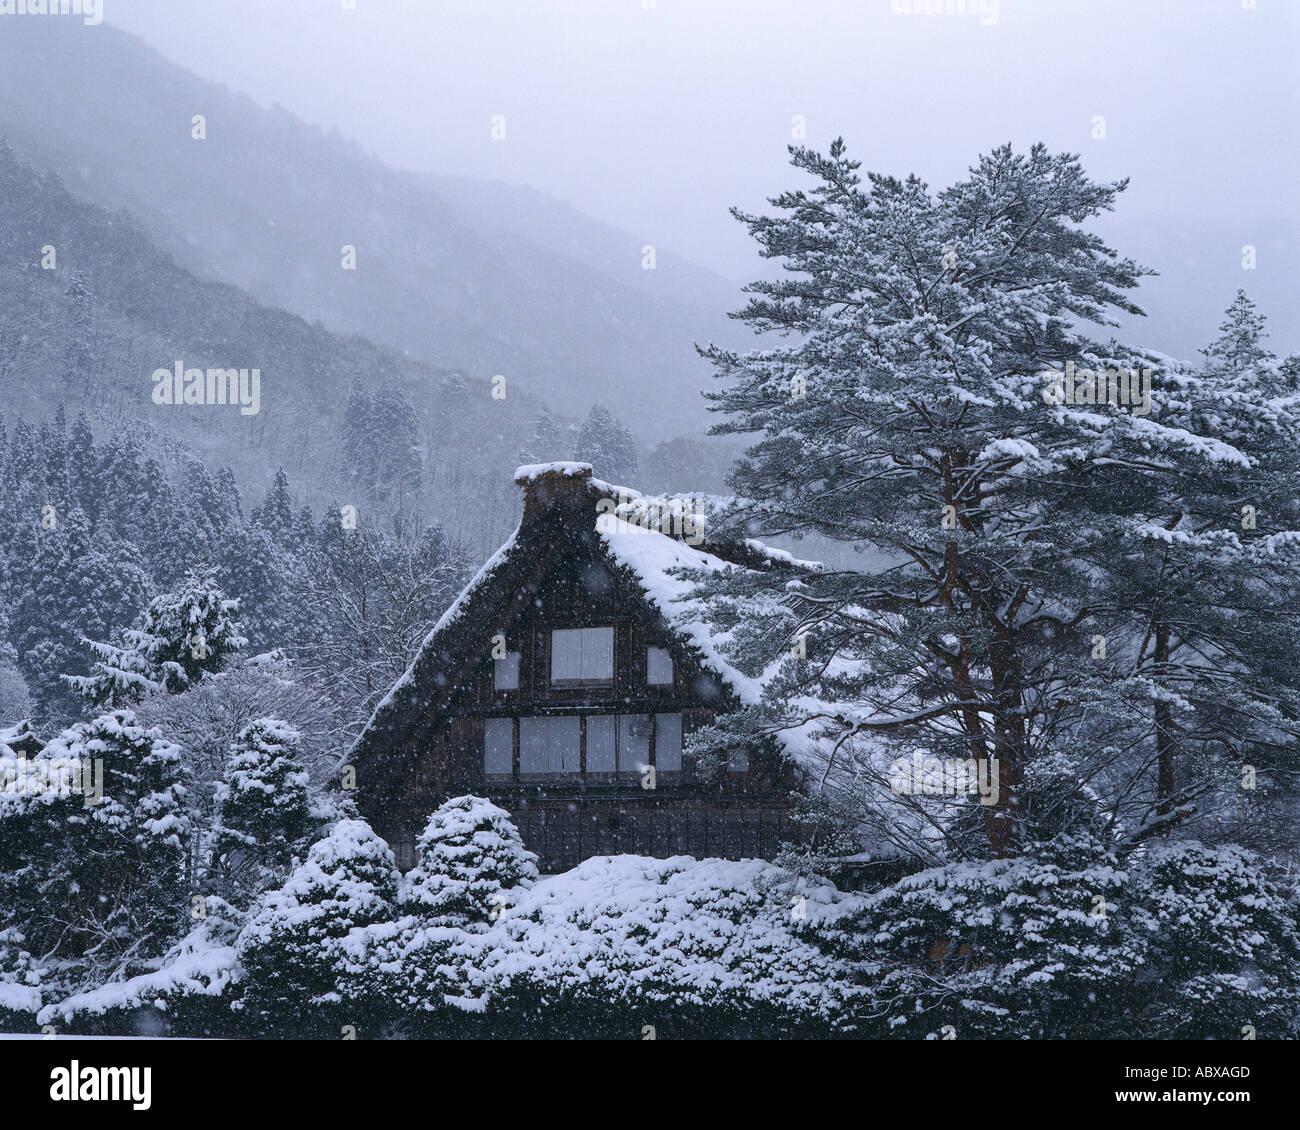 Snow covered house in Shirakawa Village Gifu Japan - Stock Image